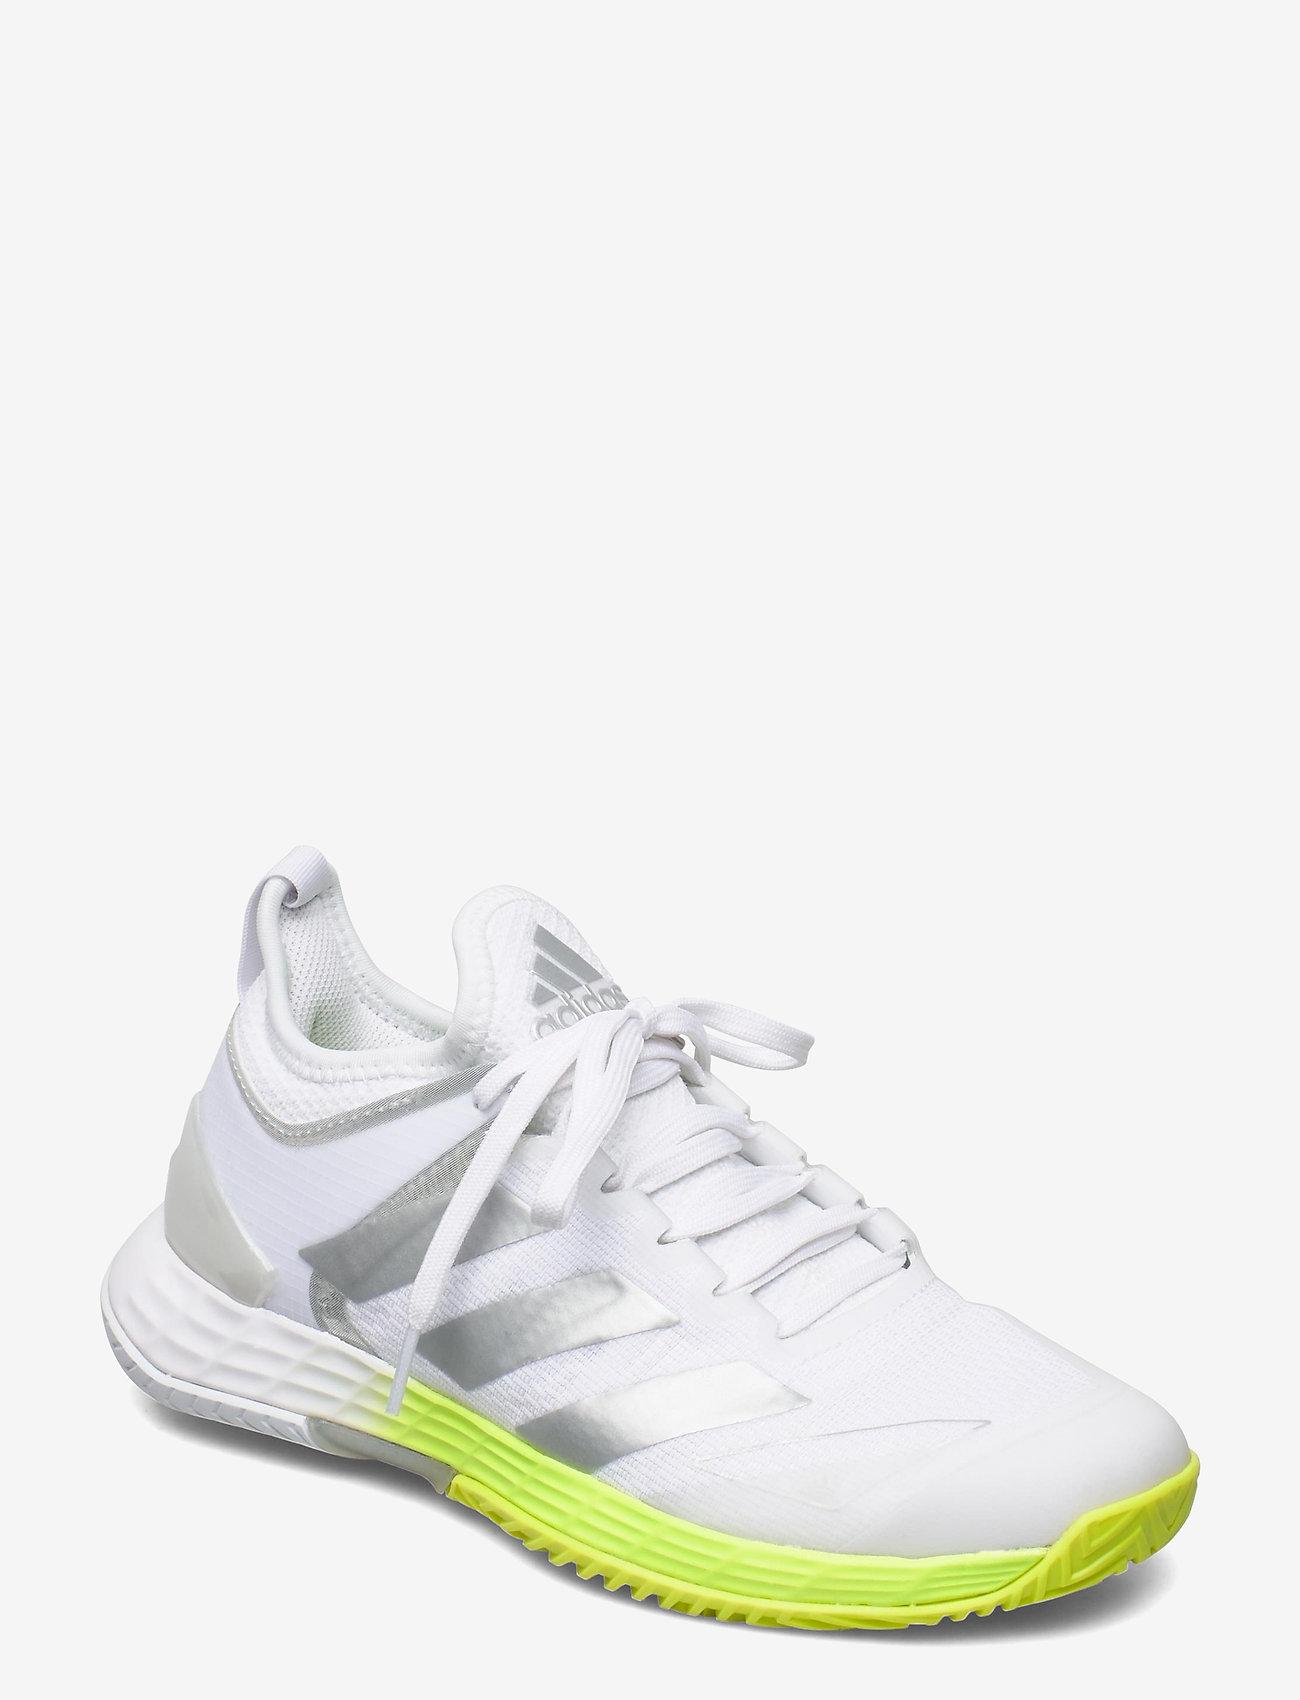 adidas Performance - Adizero Ubersonic 4 Tennis Shoes - ketsjersportsko - white - 1